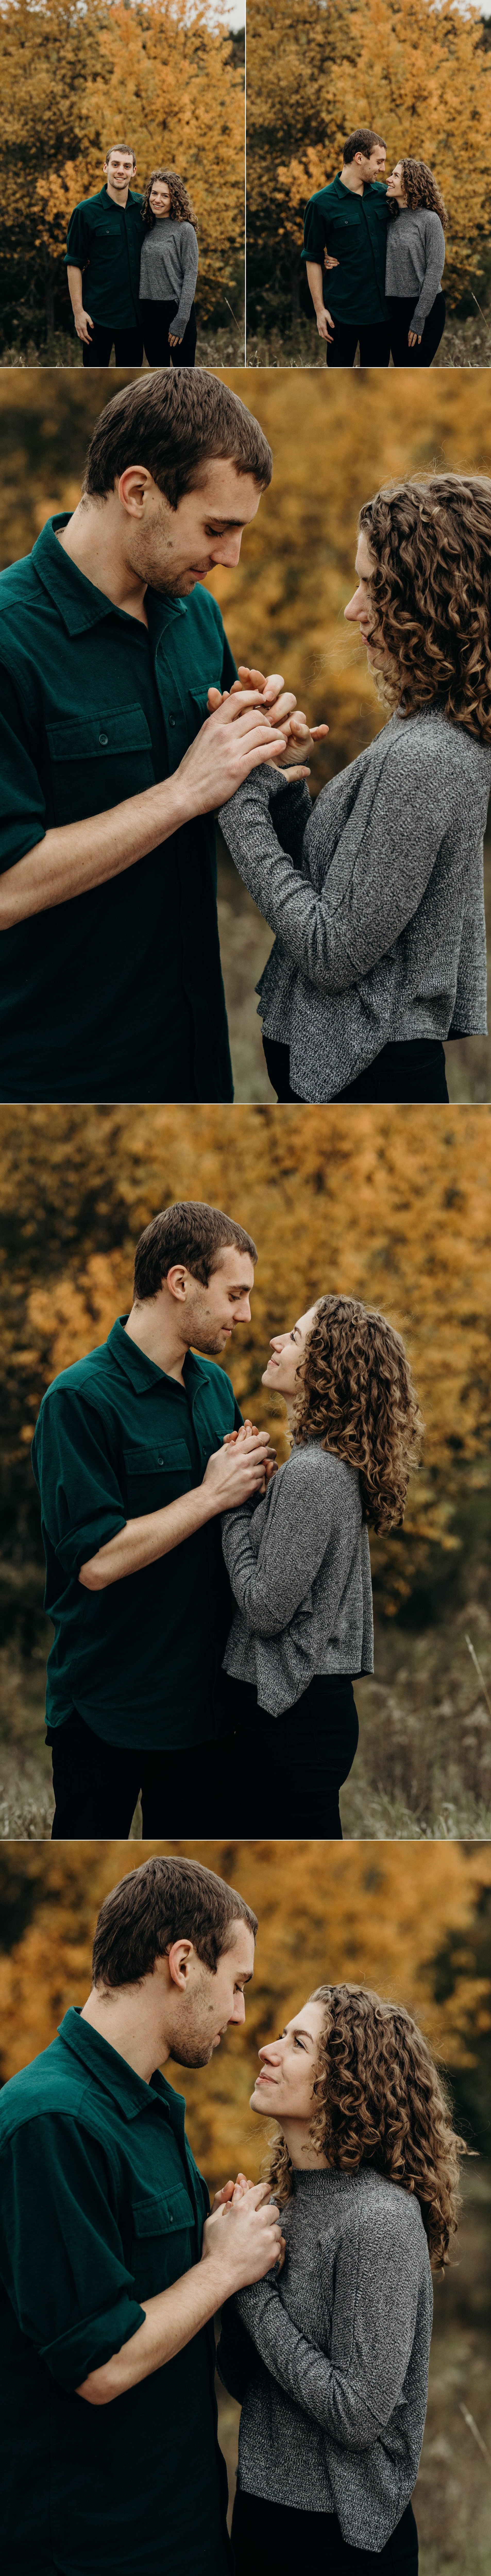 nickmezaphotography-austin-minneapolis-wedding-photographer-elopement-best-intimate-adventurous-destination-texas-minnesota-engagement-jess-dan-spacesaver_0201.jpg